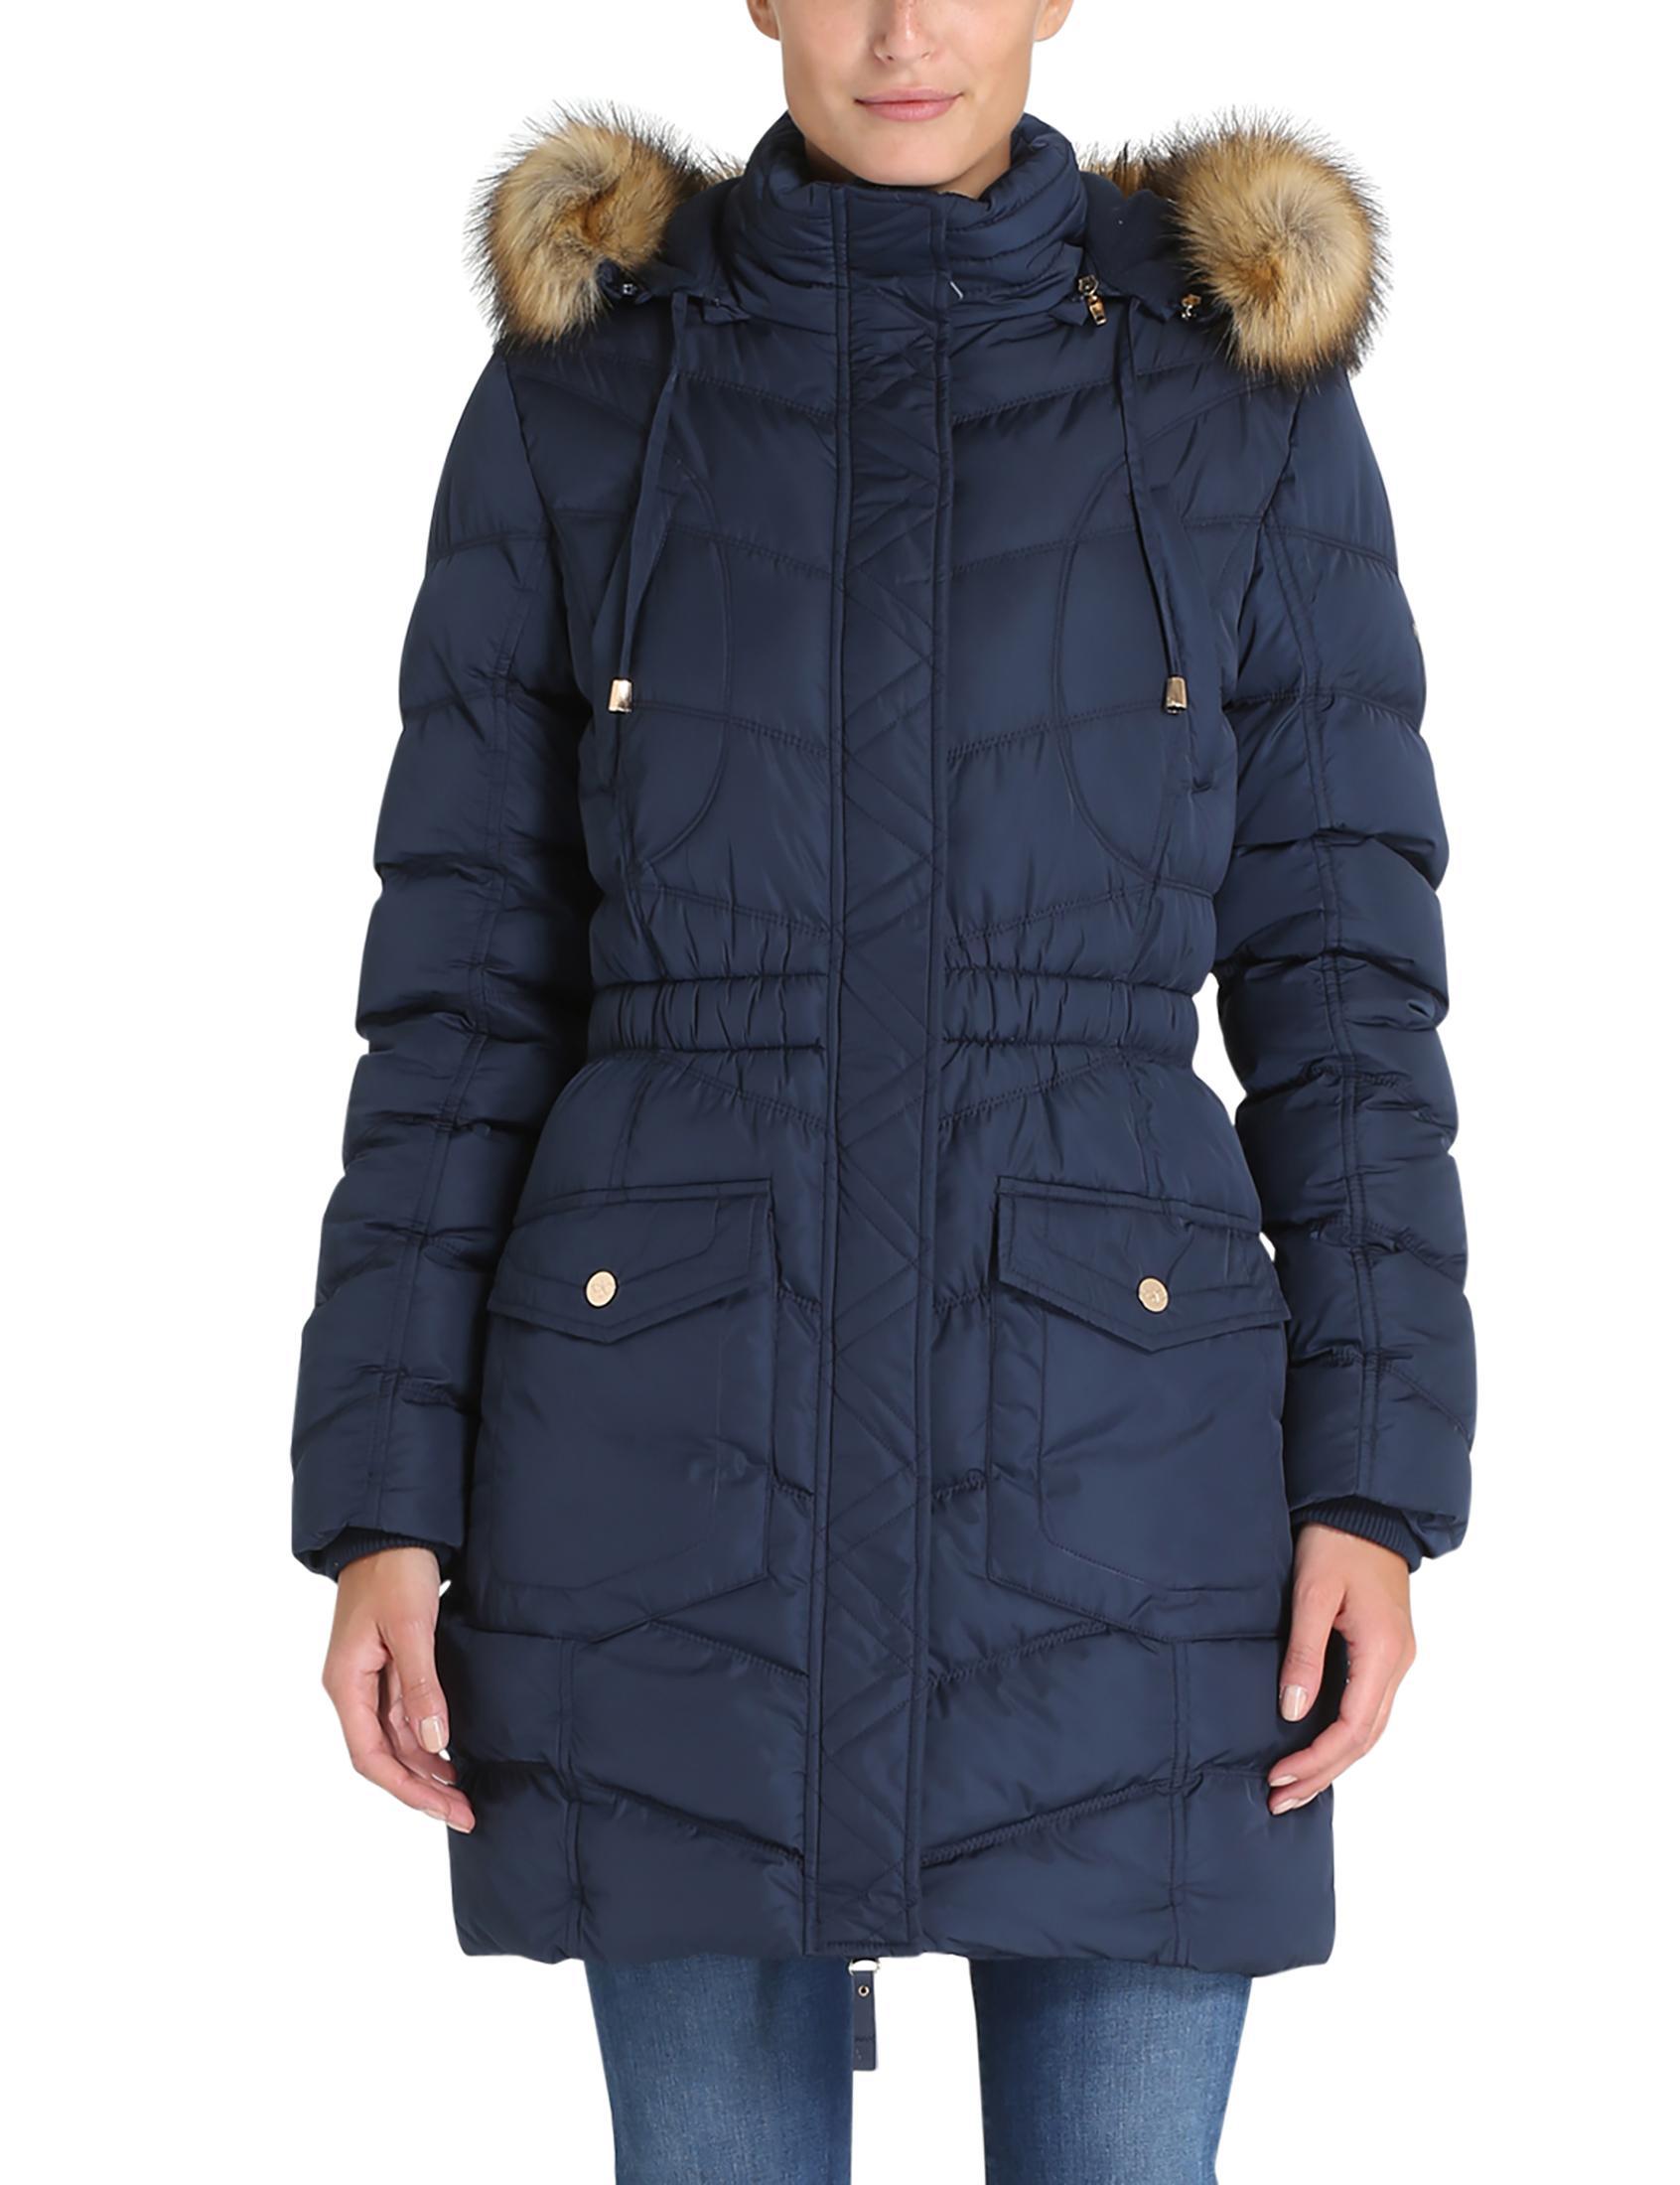 Berydale Women's Winter Coat, Navy, XL: Amazon.co.uk: Clothing